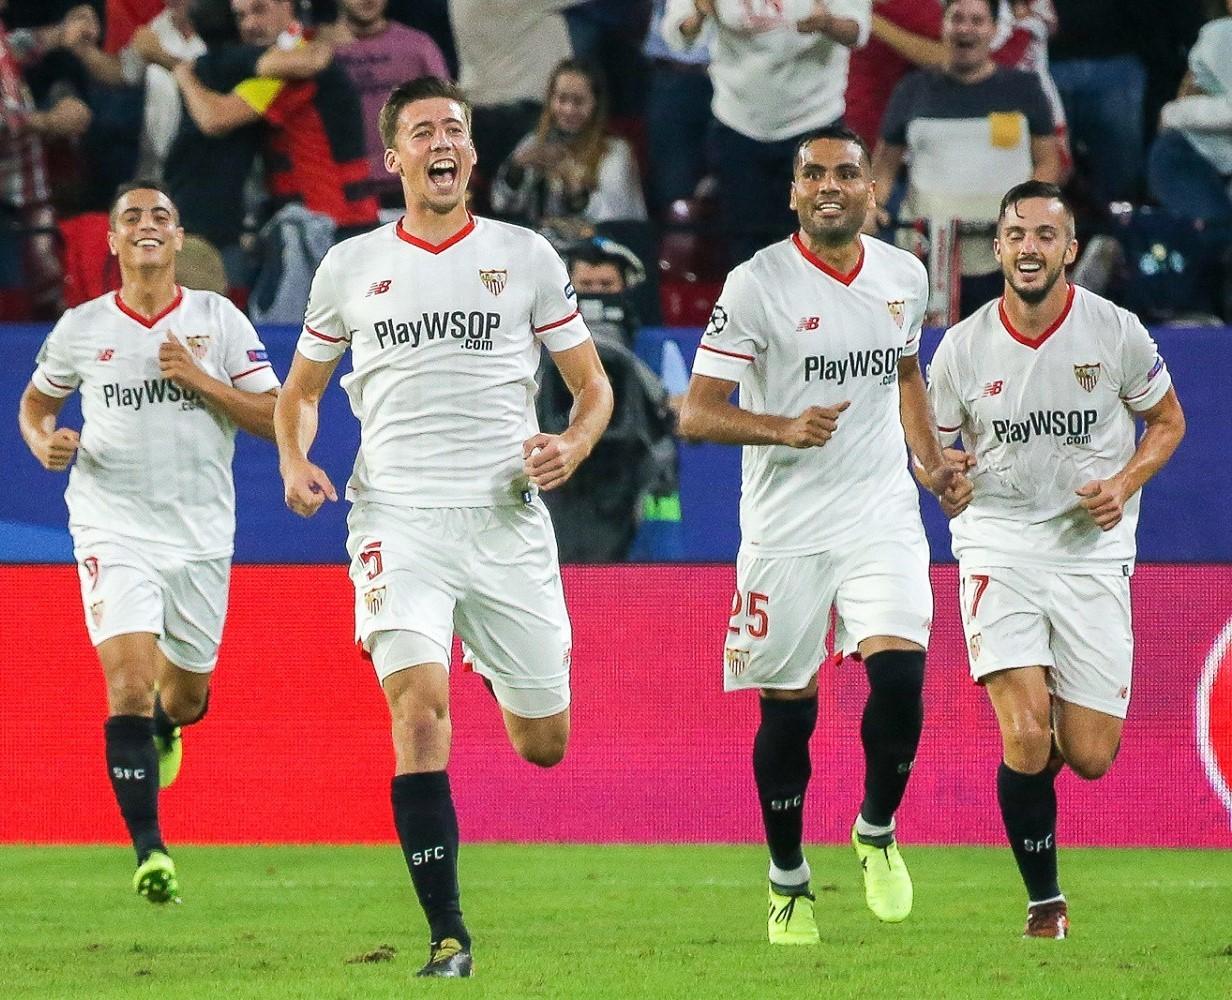 Pojedynek o podium w tabeli La Liga